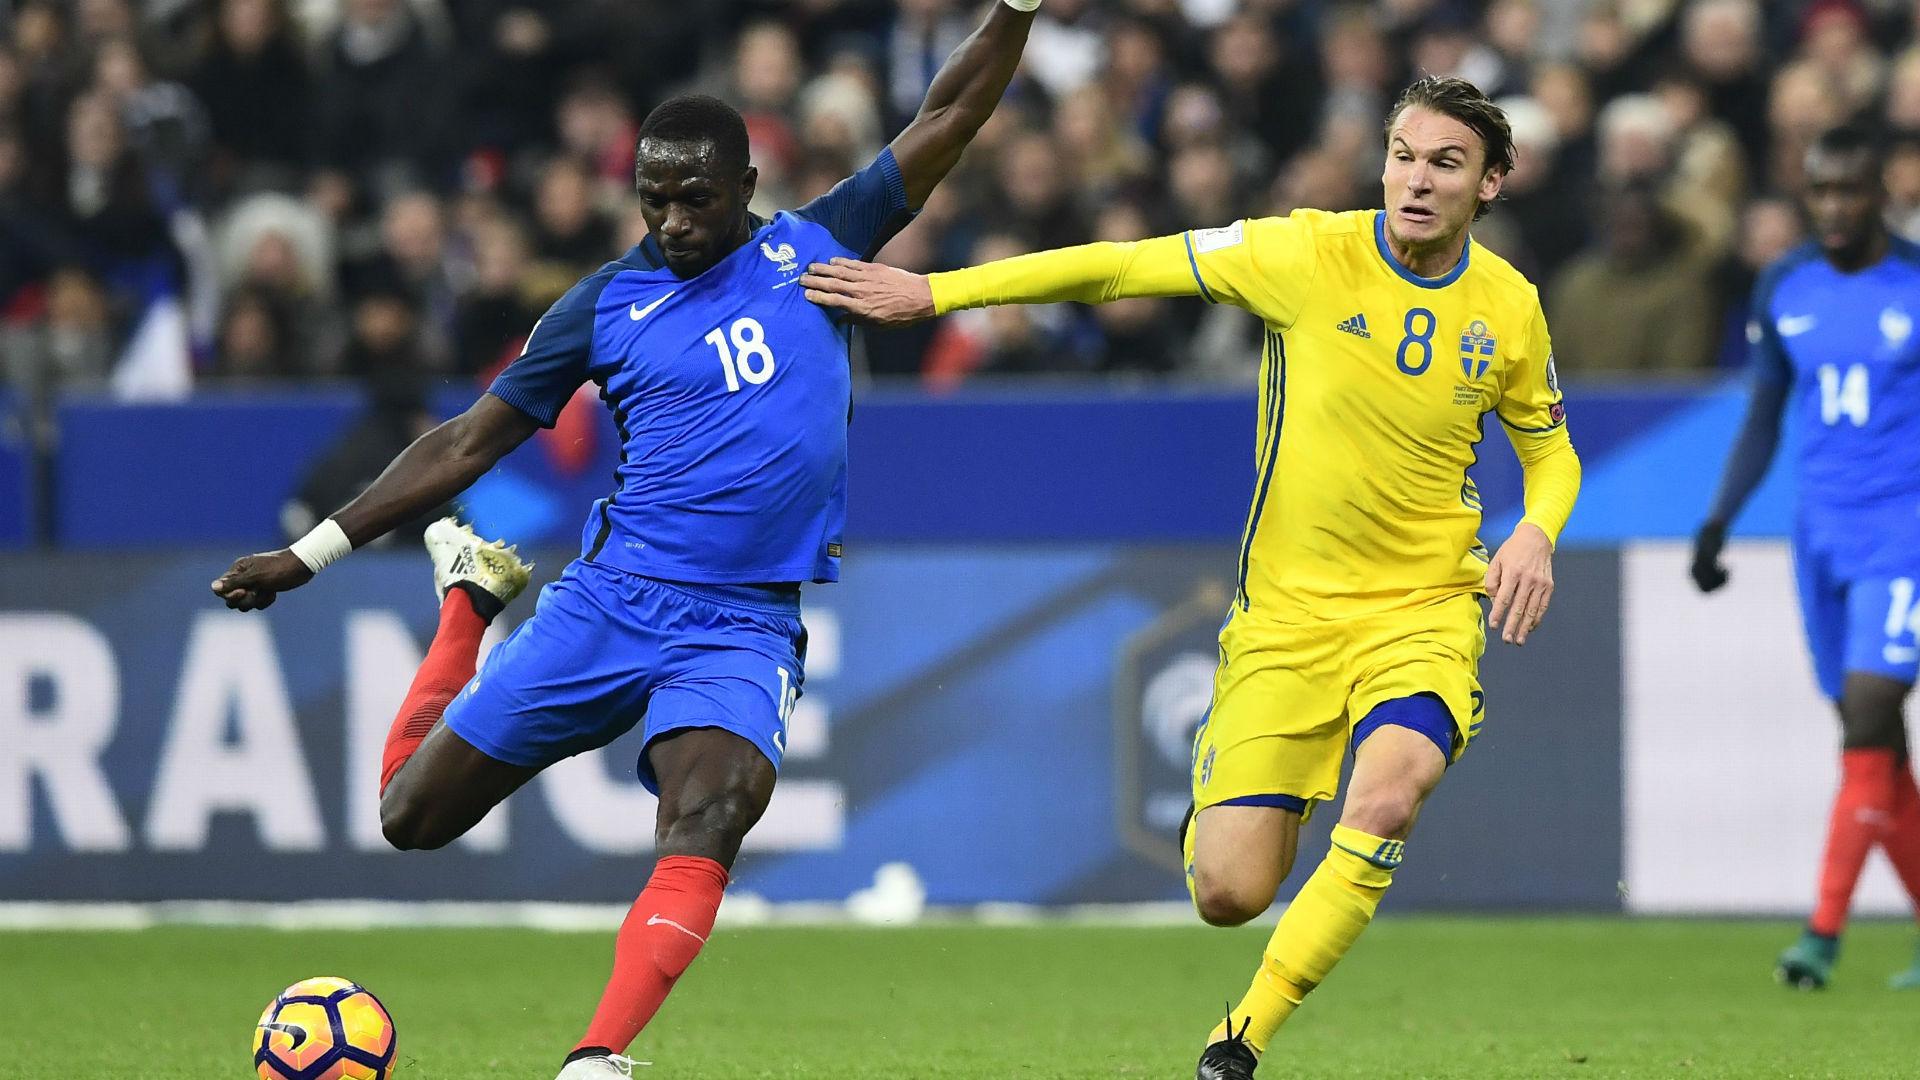 Moussa Sissoko Albin Ekdal France Sweden World Cup Qualifiers 11112016